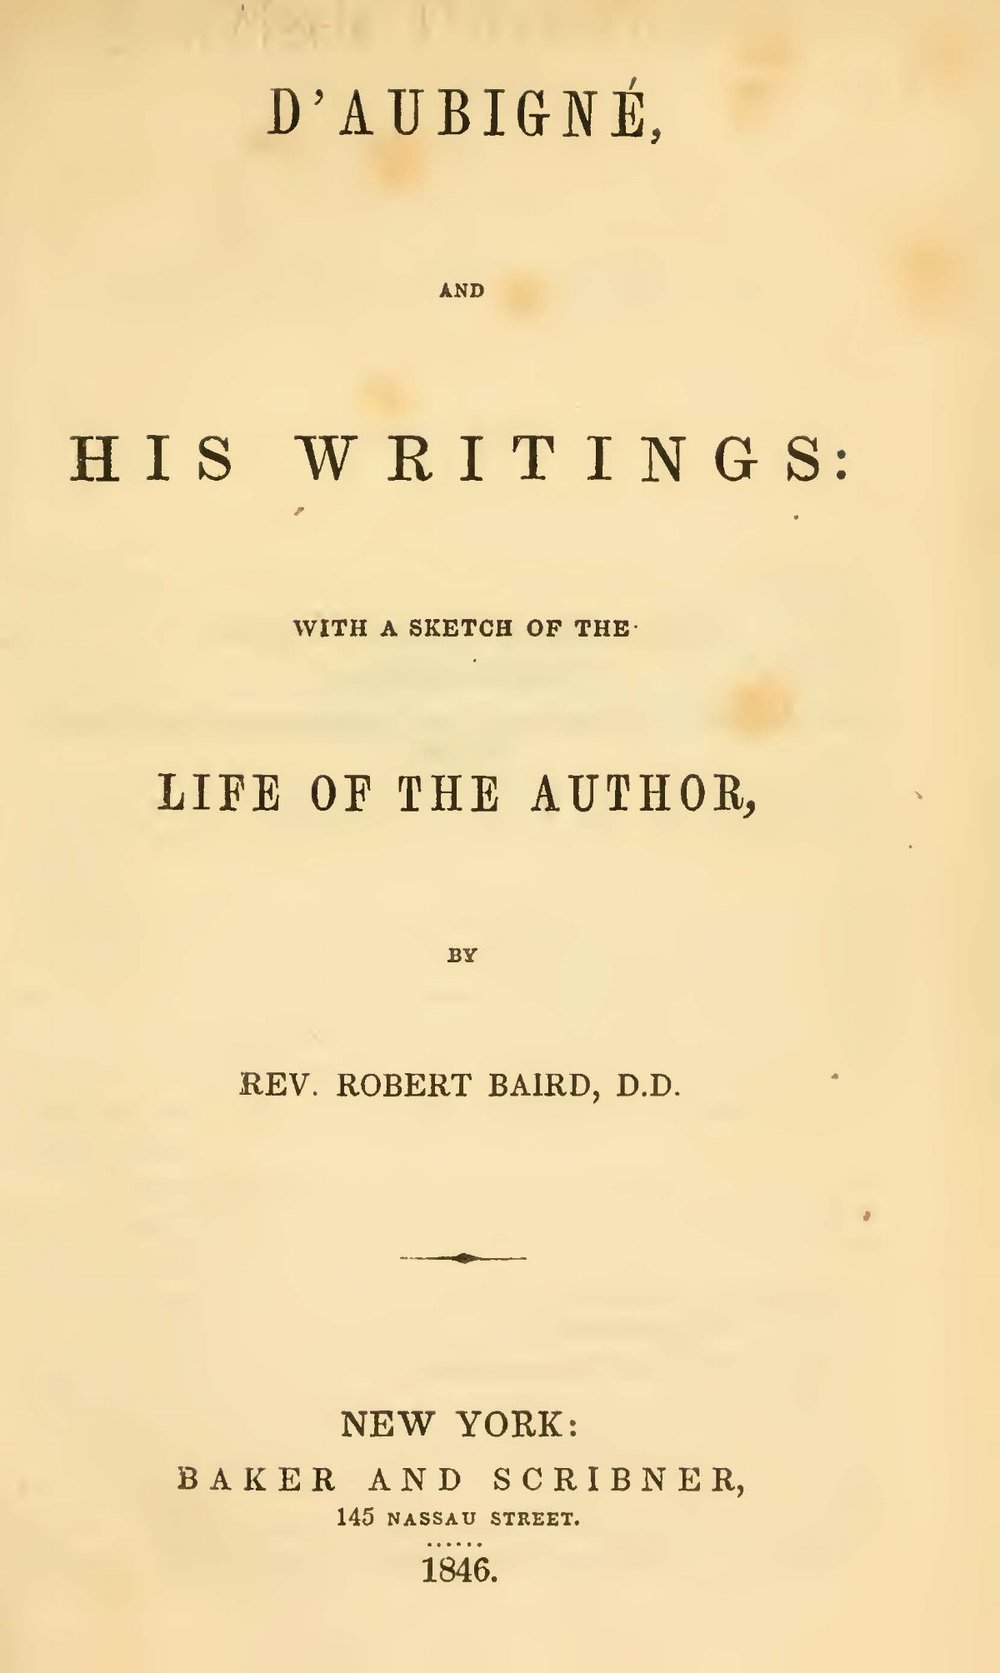 Baird, Robert, D'Aubigné and His Writings Title Page.jpg